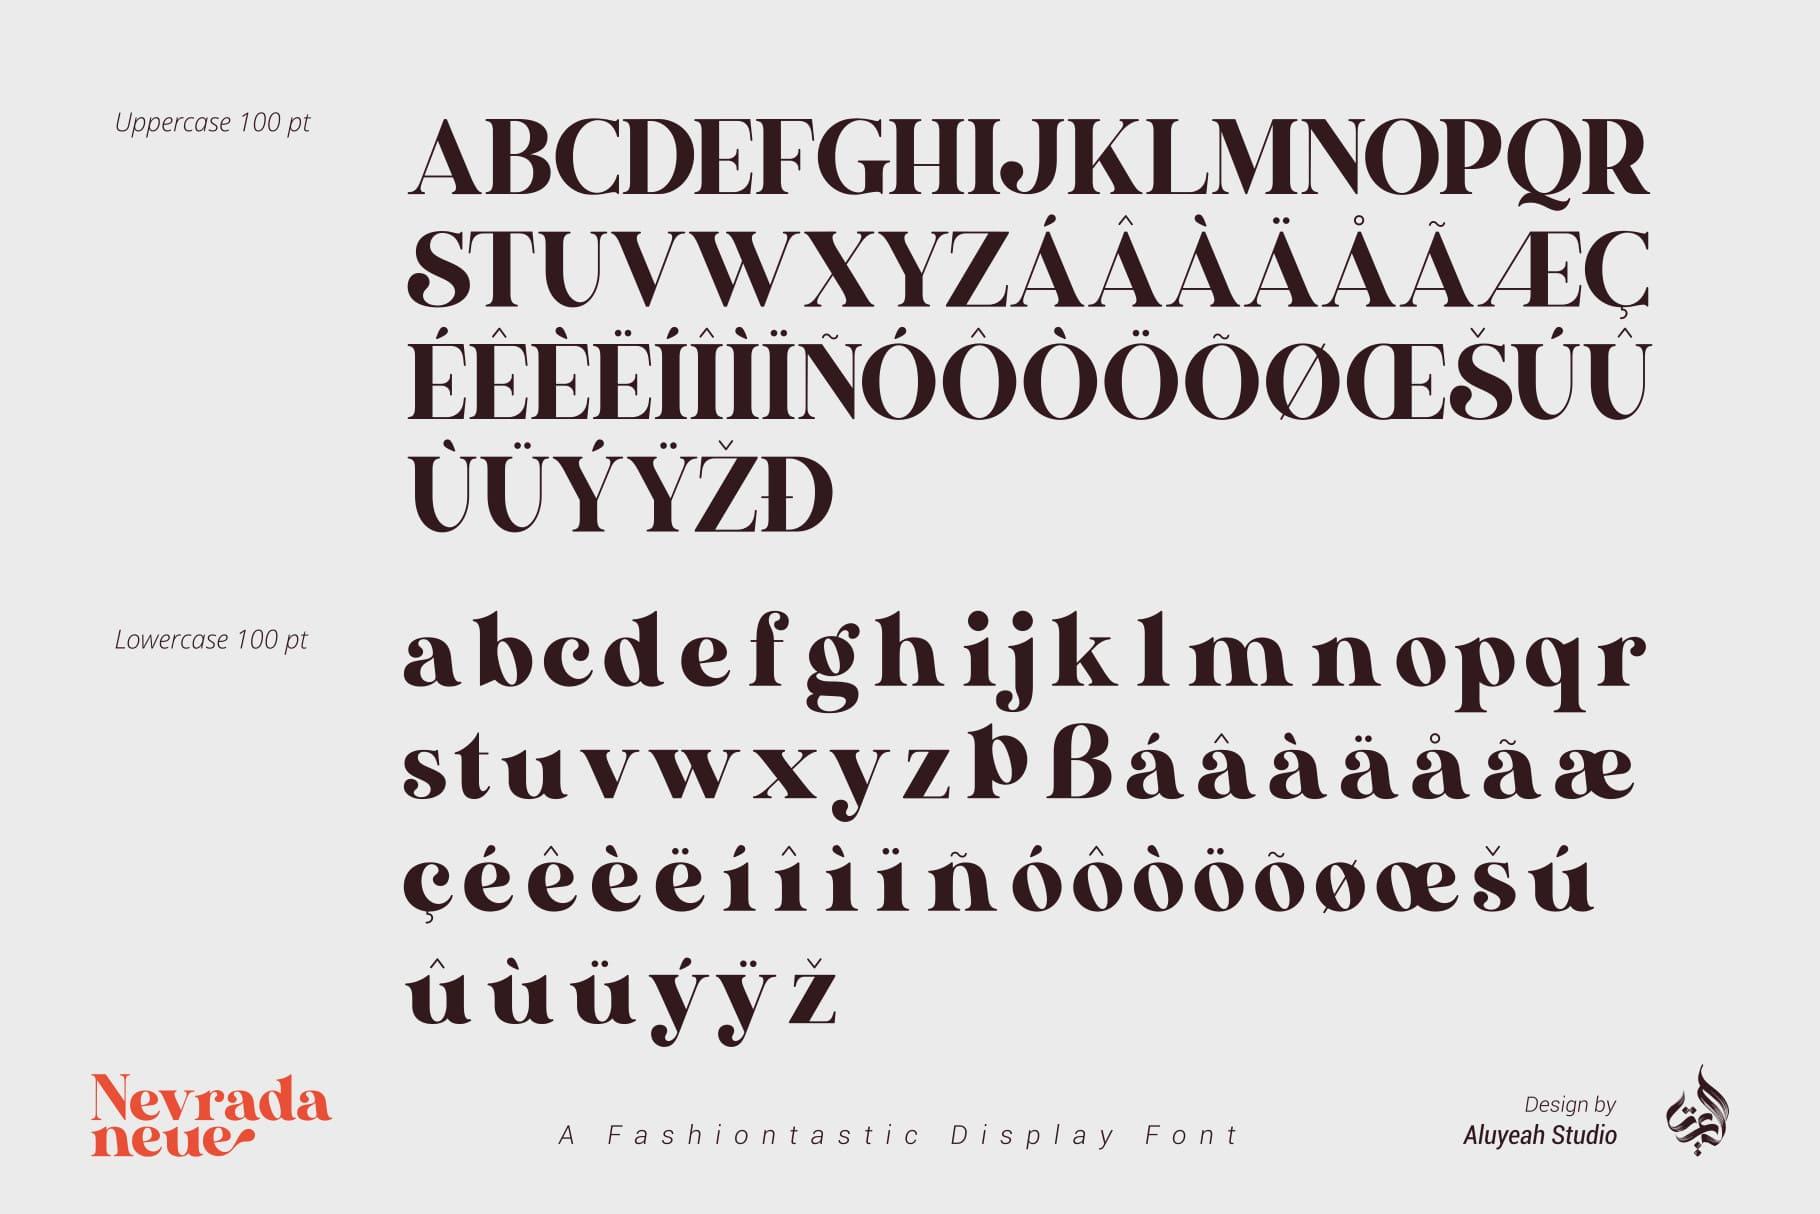 Nevrada Neue a Fashiontastic Display Font